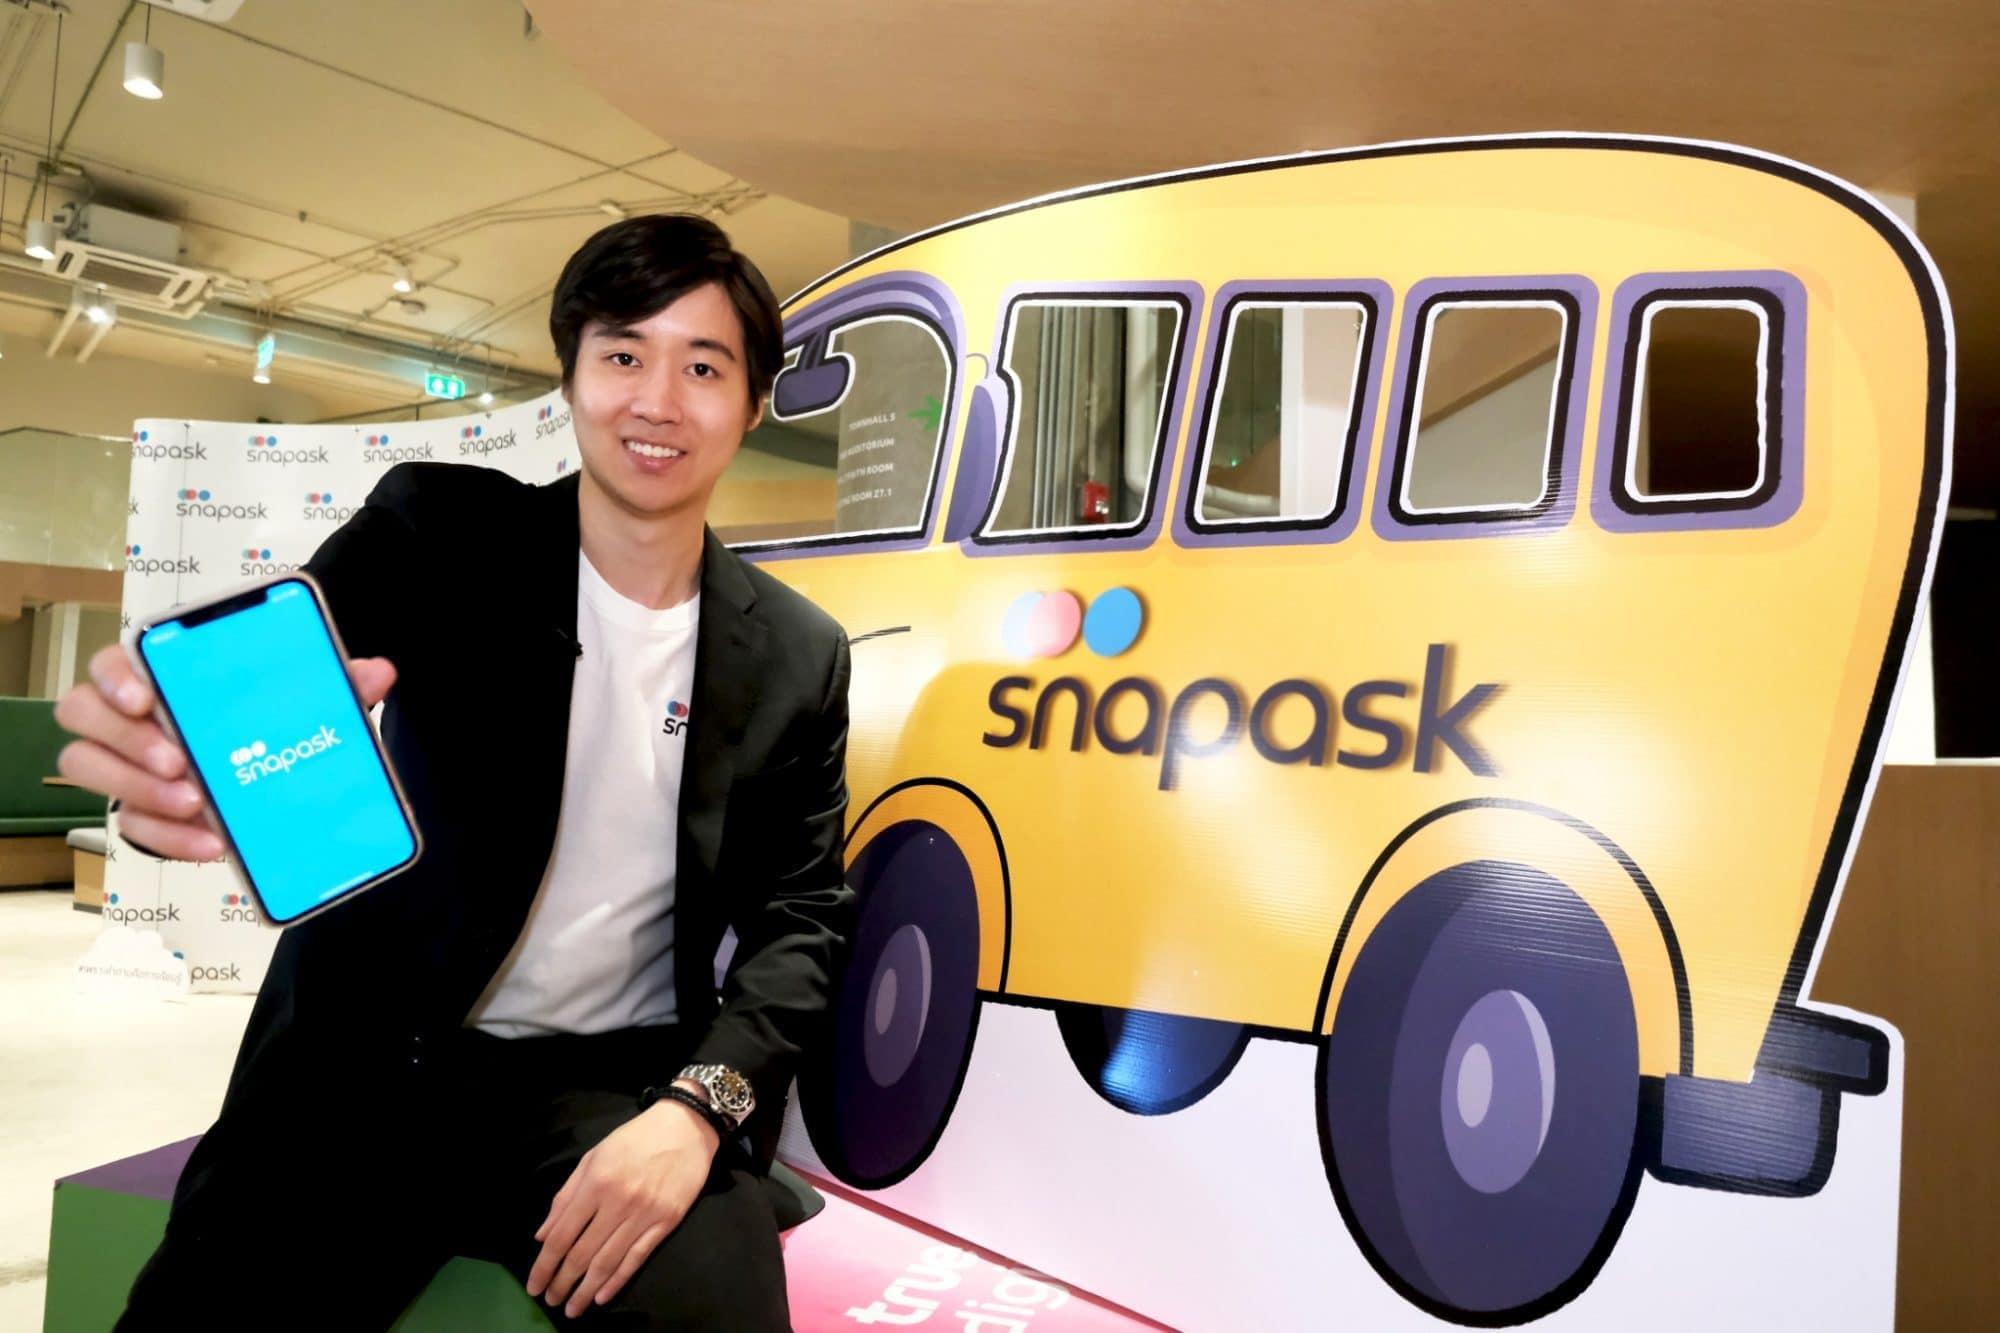 - Snapask                                                                         CEO Snapask Thailand - Snapask New Gen Dream เผย 3 ฟีเจอร์ใหม่ เพื่อเด็กรักเรียน